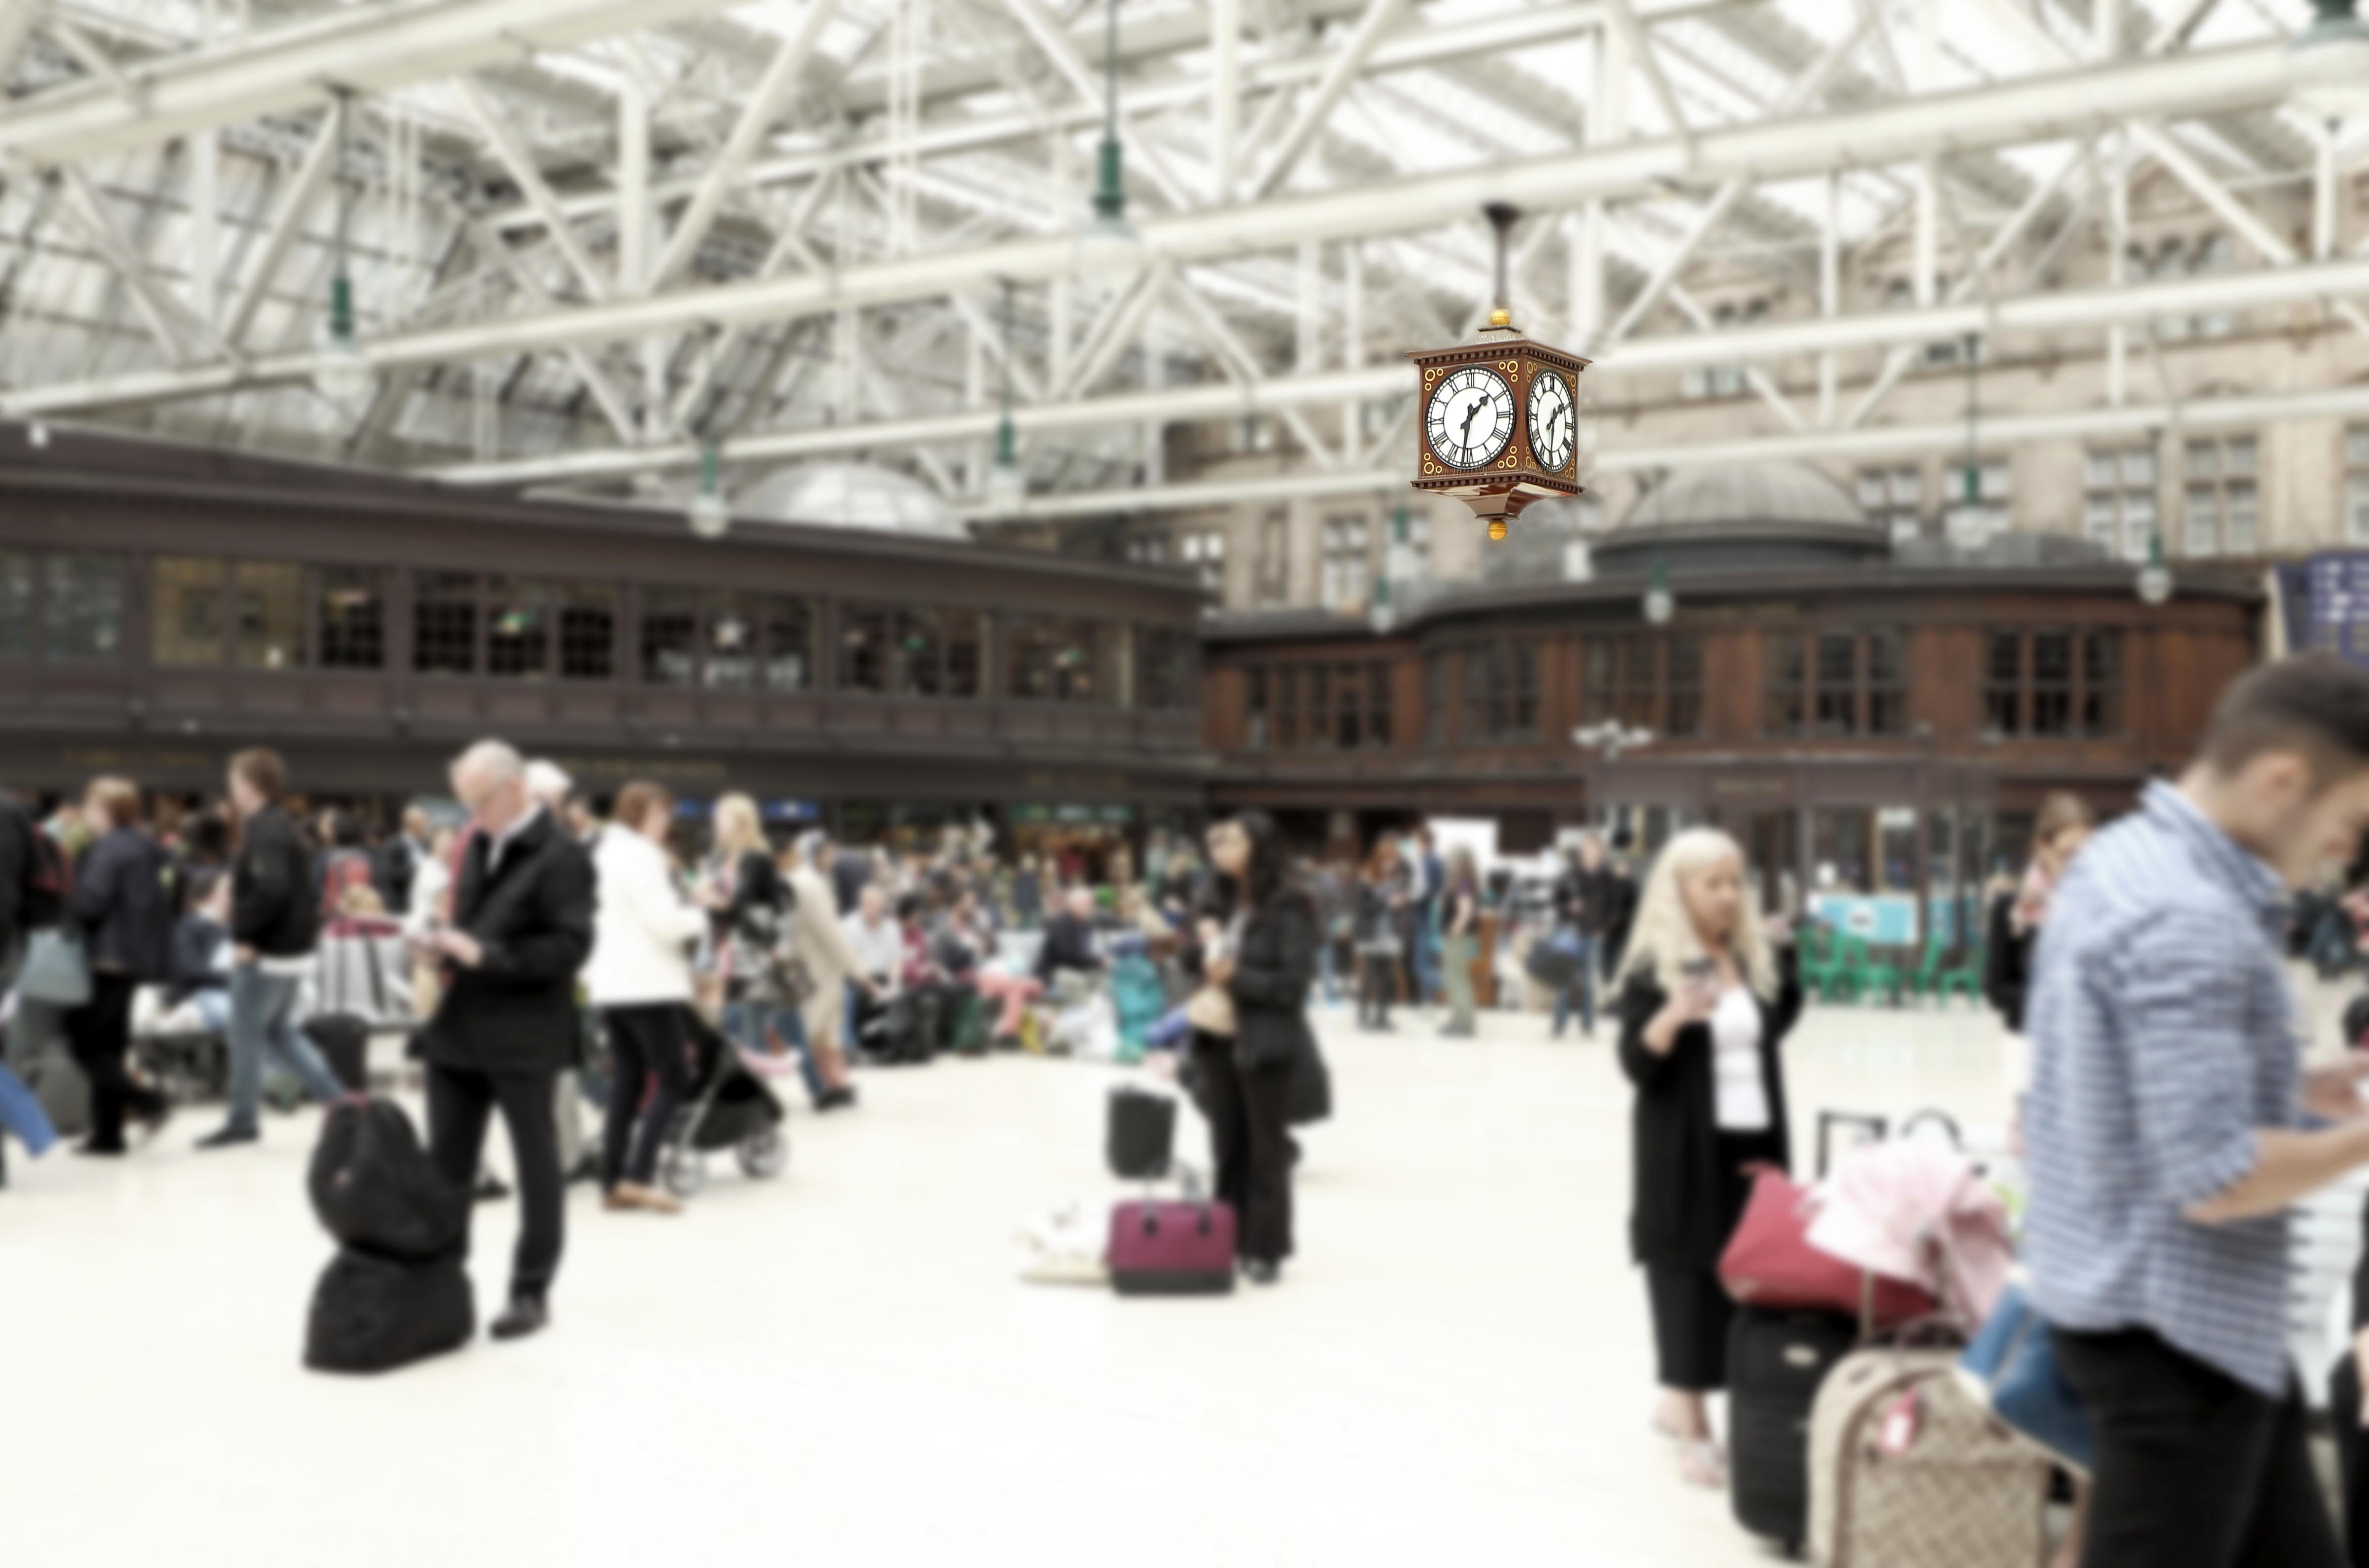 Scottish Commuter Research | Travel Research Scotland | Scotrail Research | Censuswide